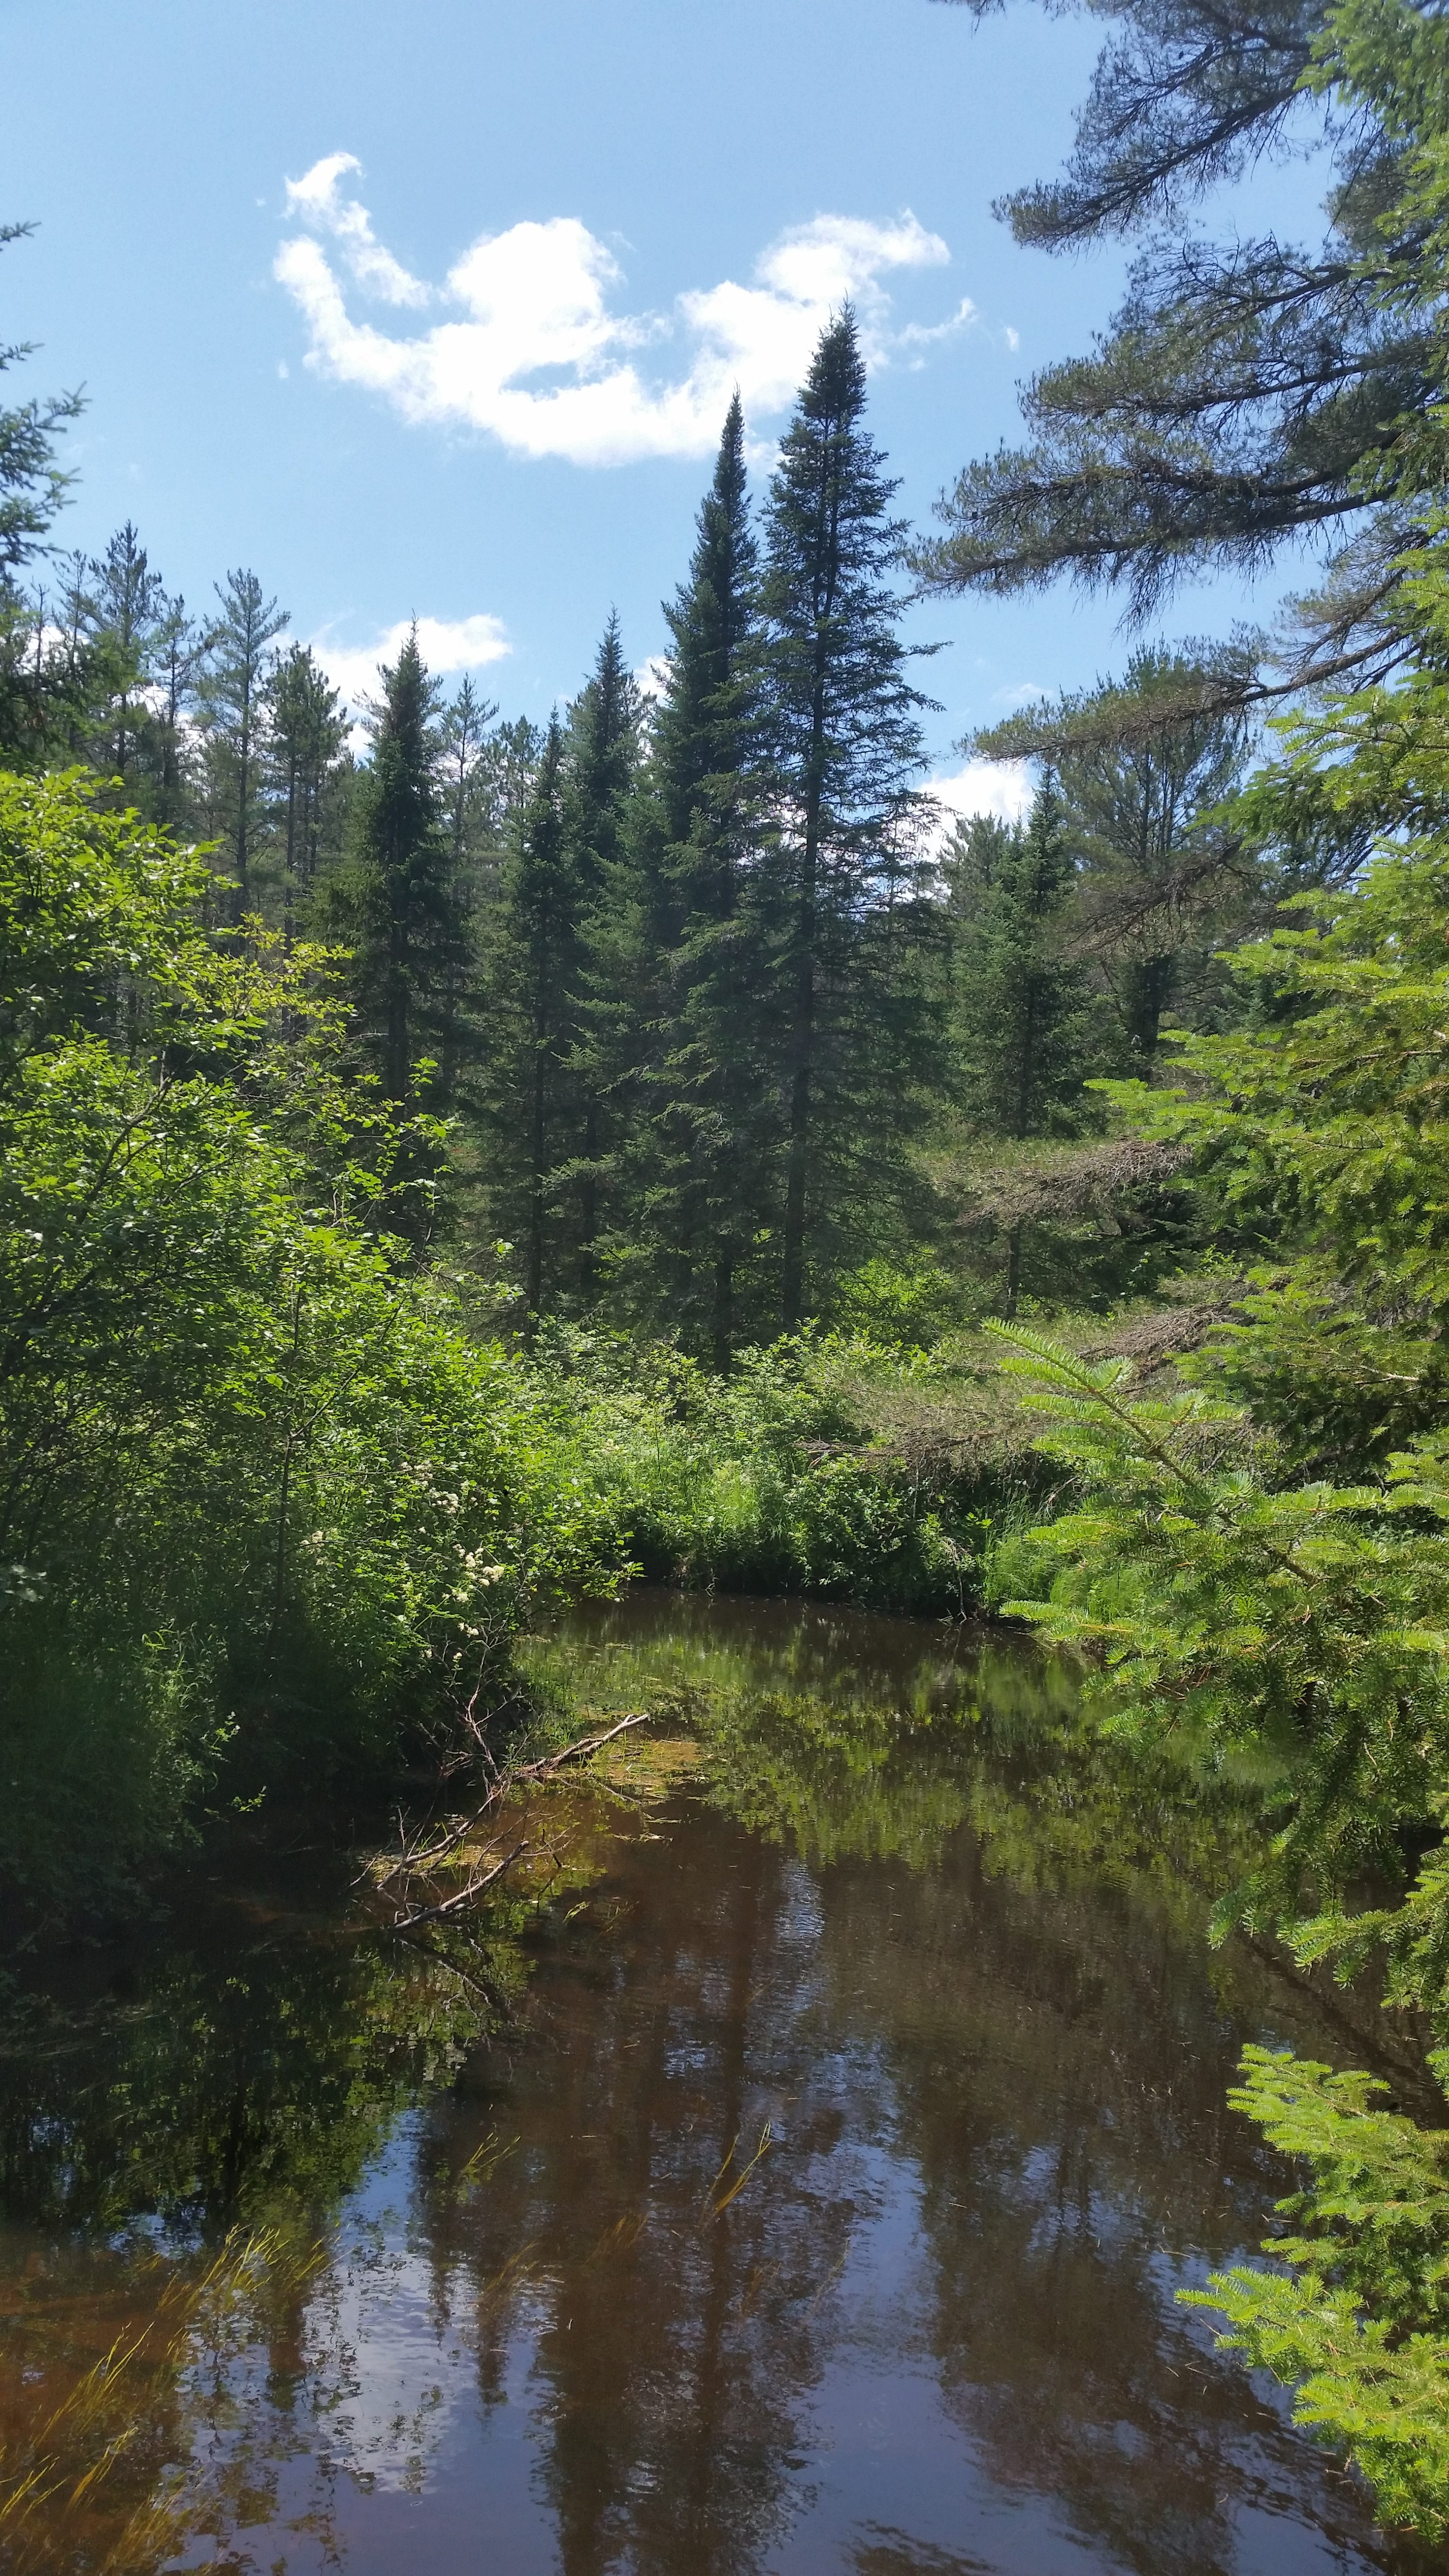 creek, pine trees, sky